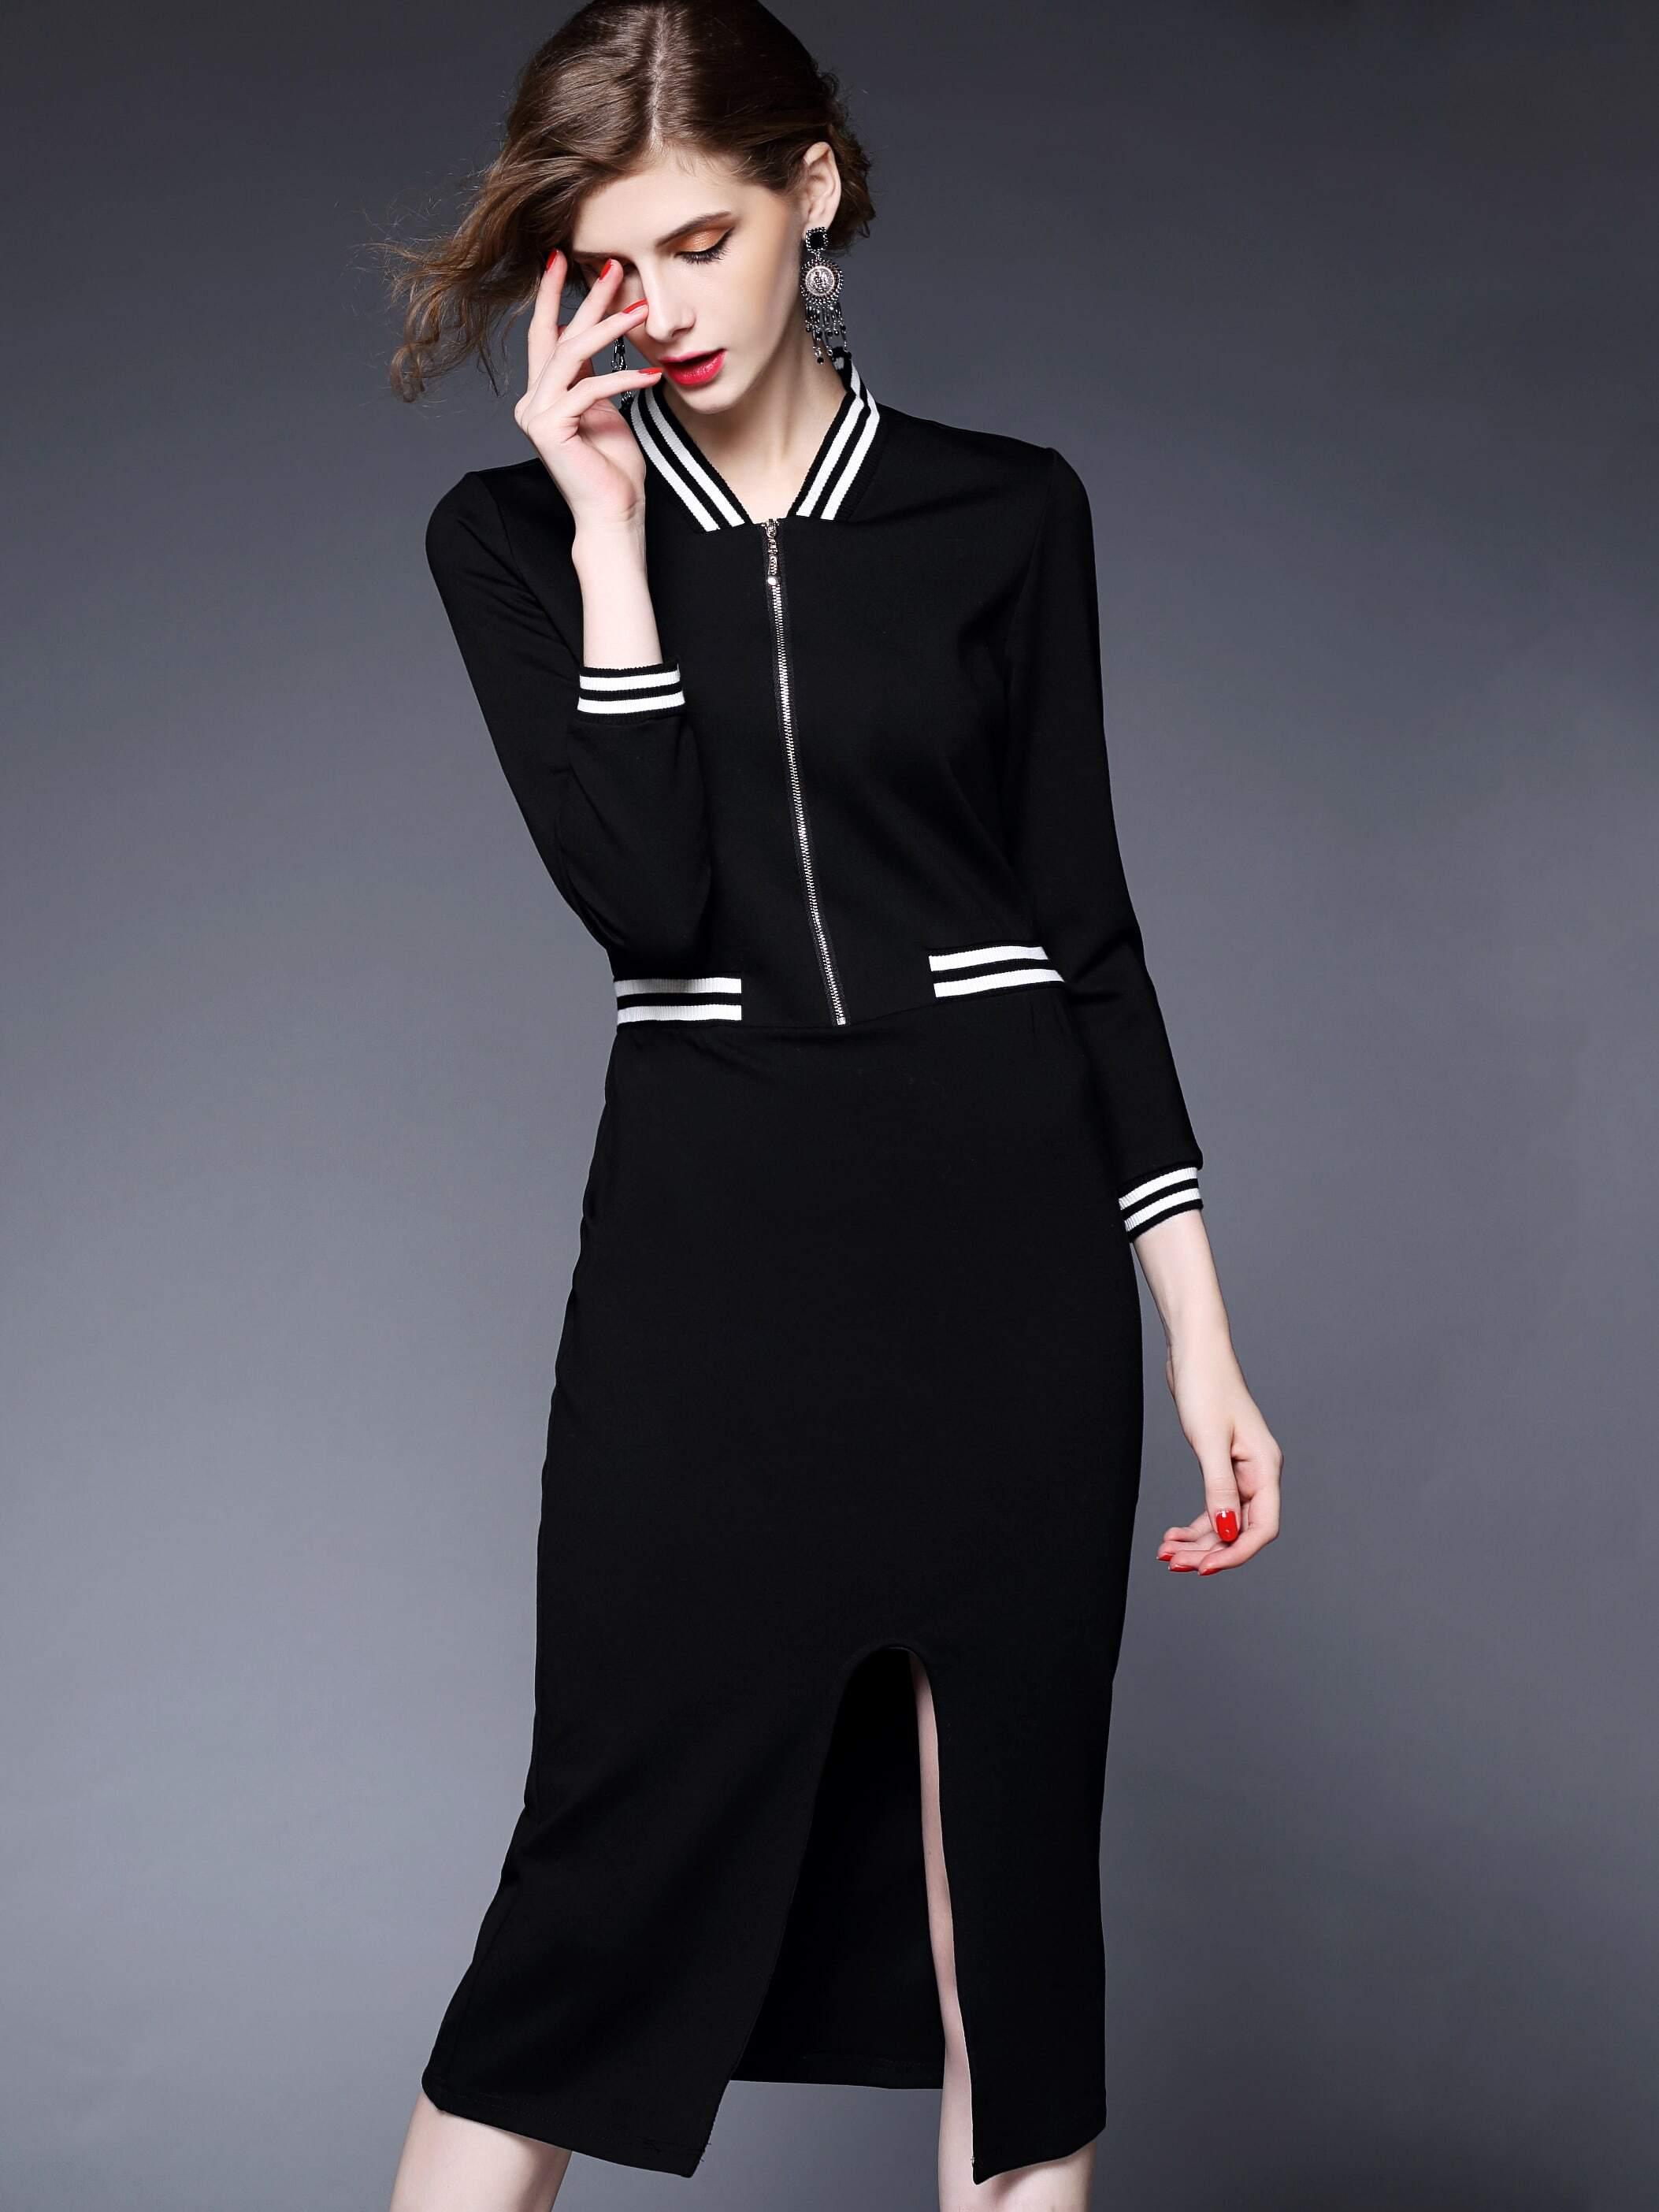 Black Round Neck Length Sleeve Bodycon Dress